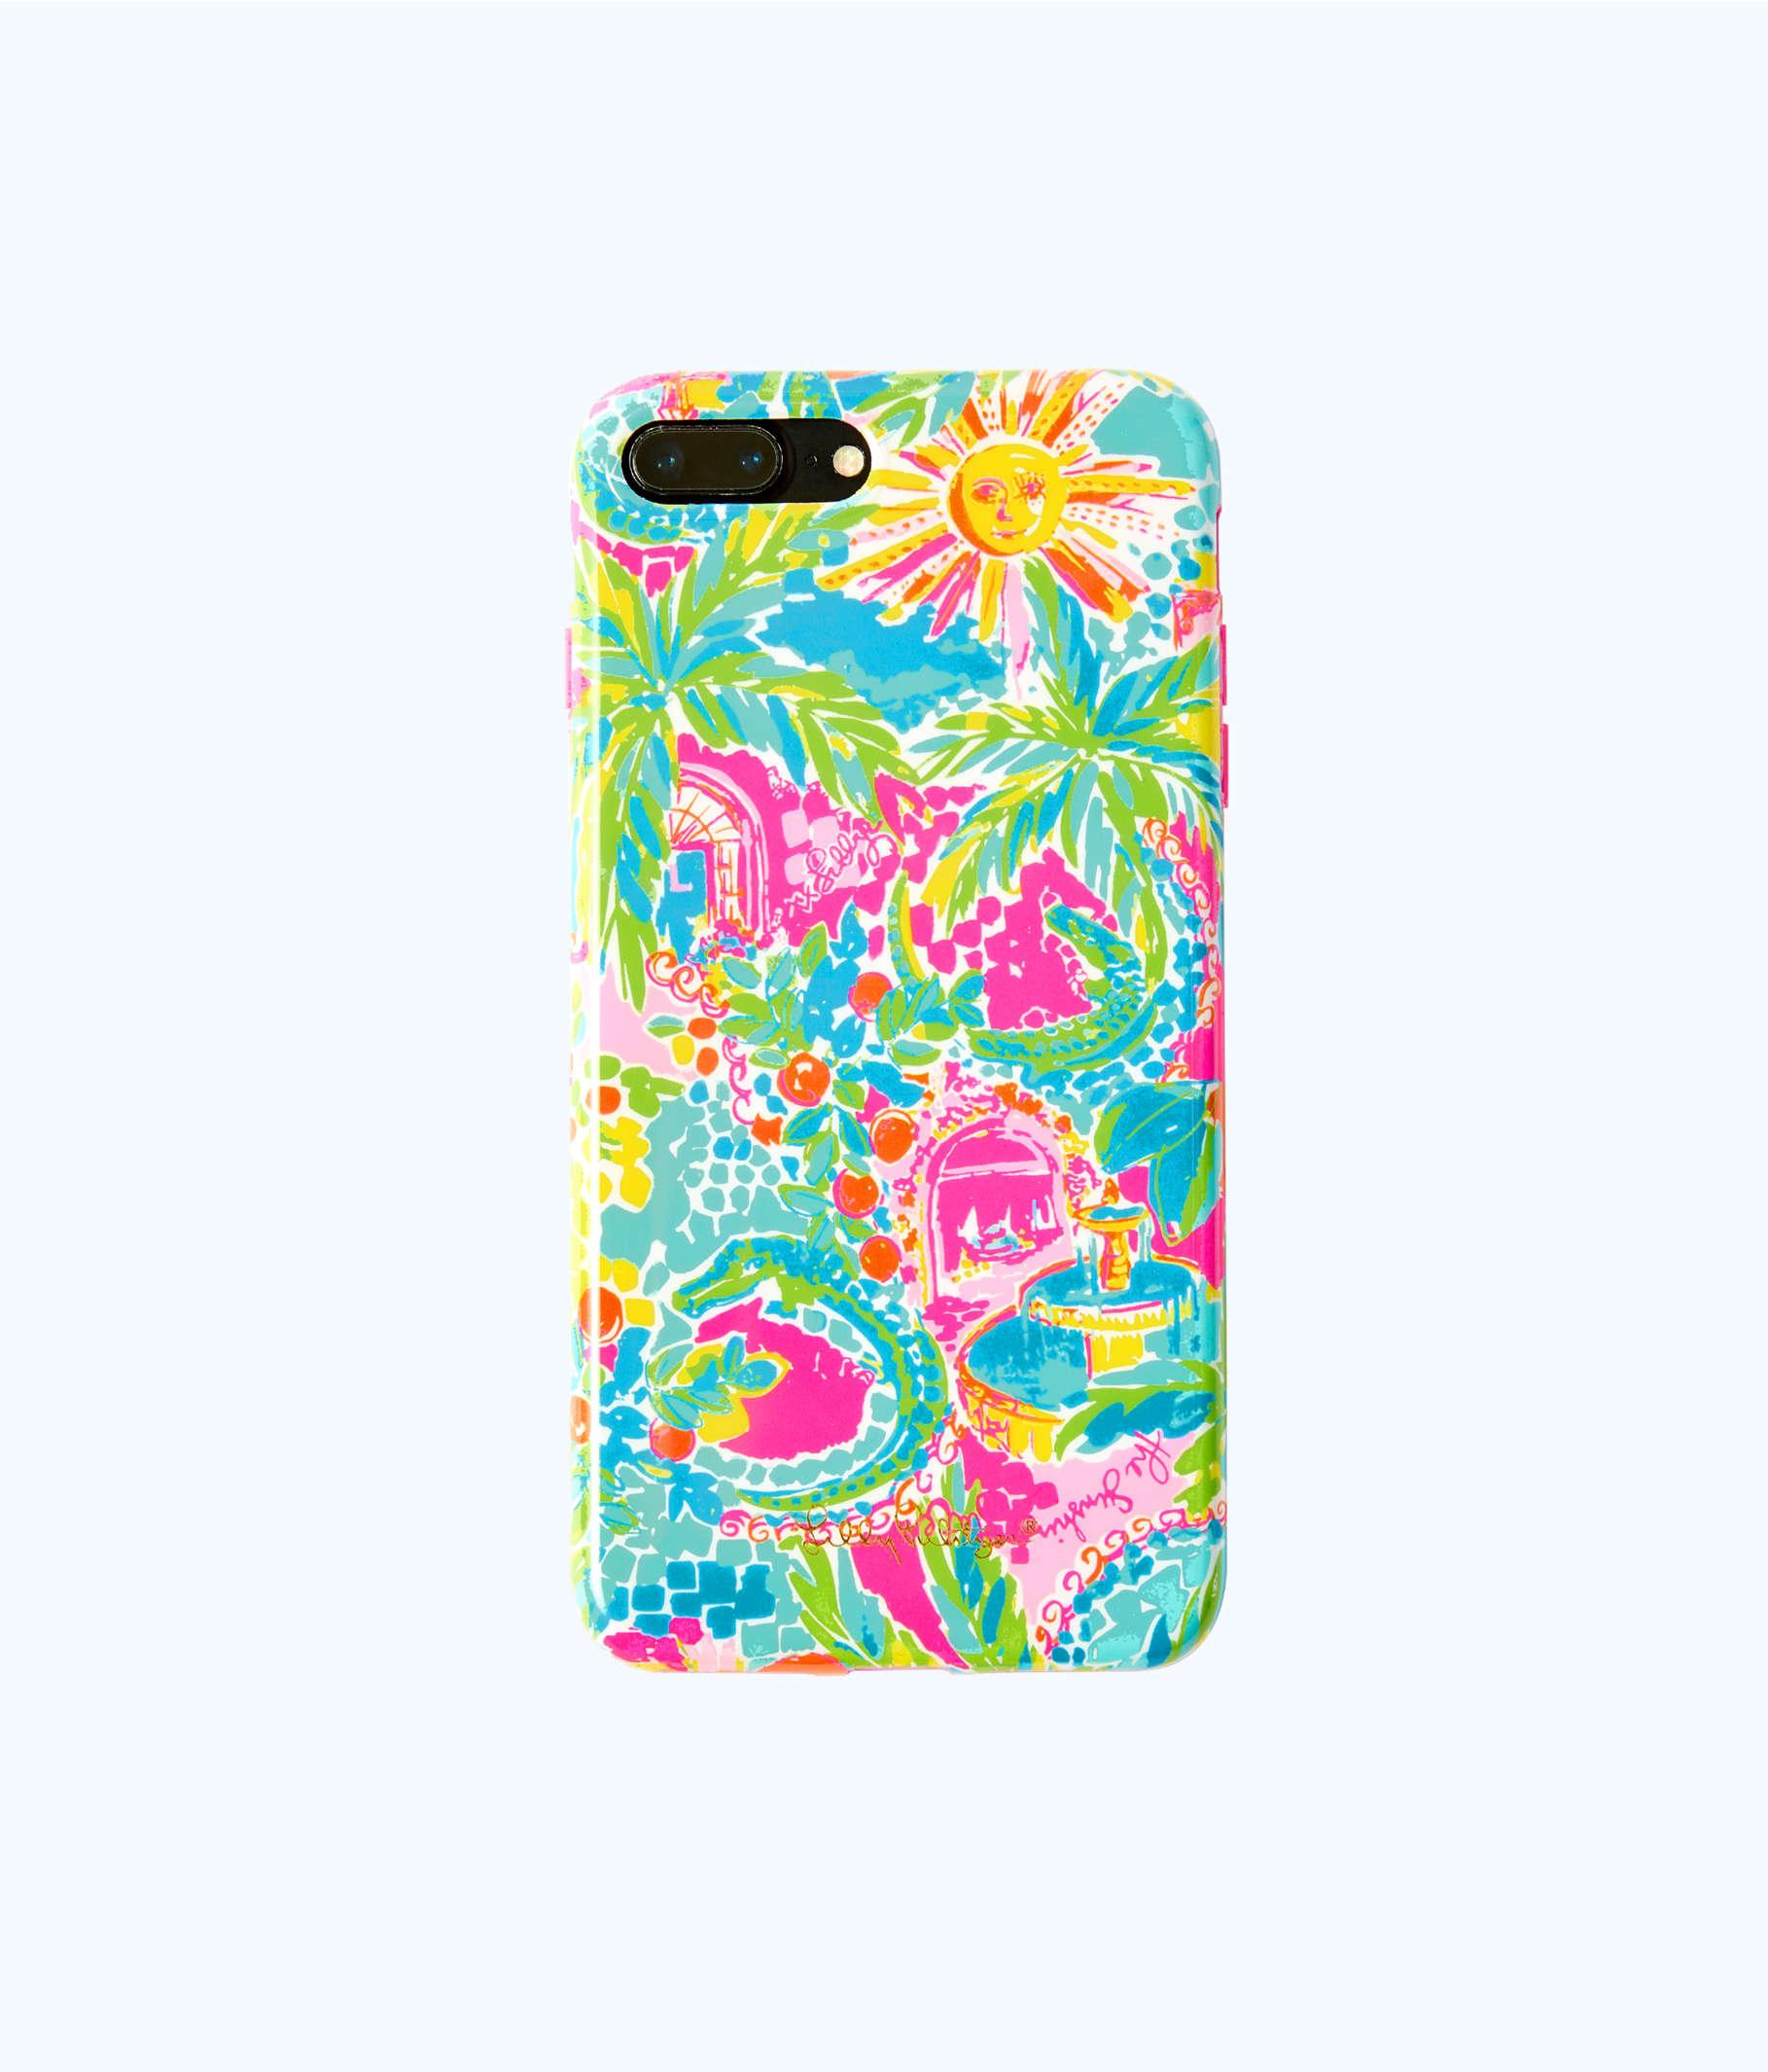 online retailer 60493 0d6c9 iPhone 7/8 Plus Case | 002826 | Lilly Pulitzer